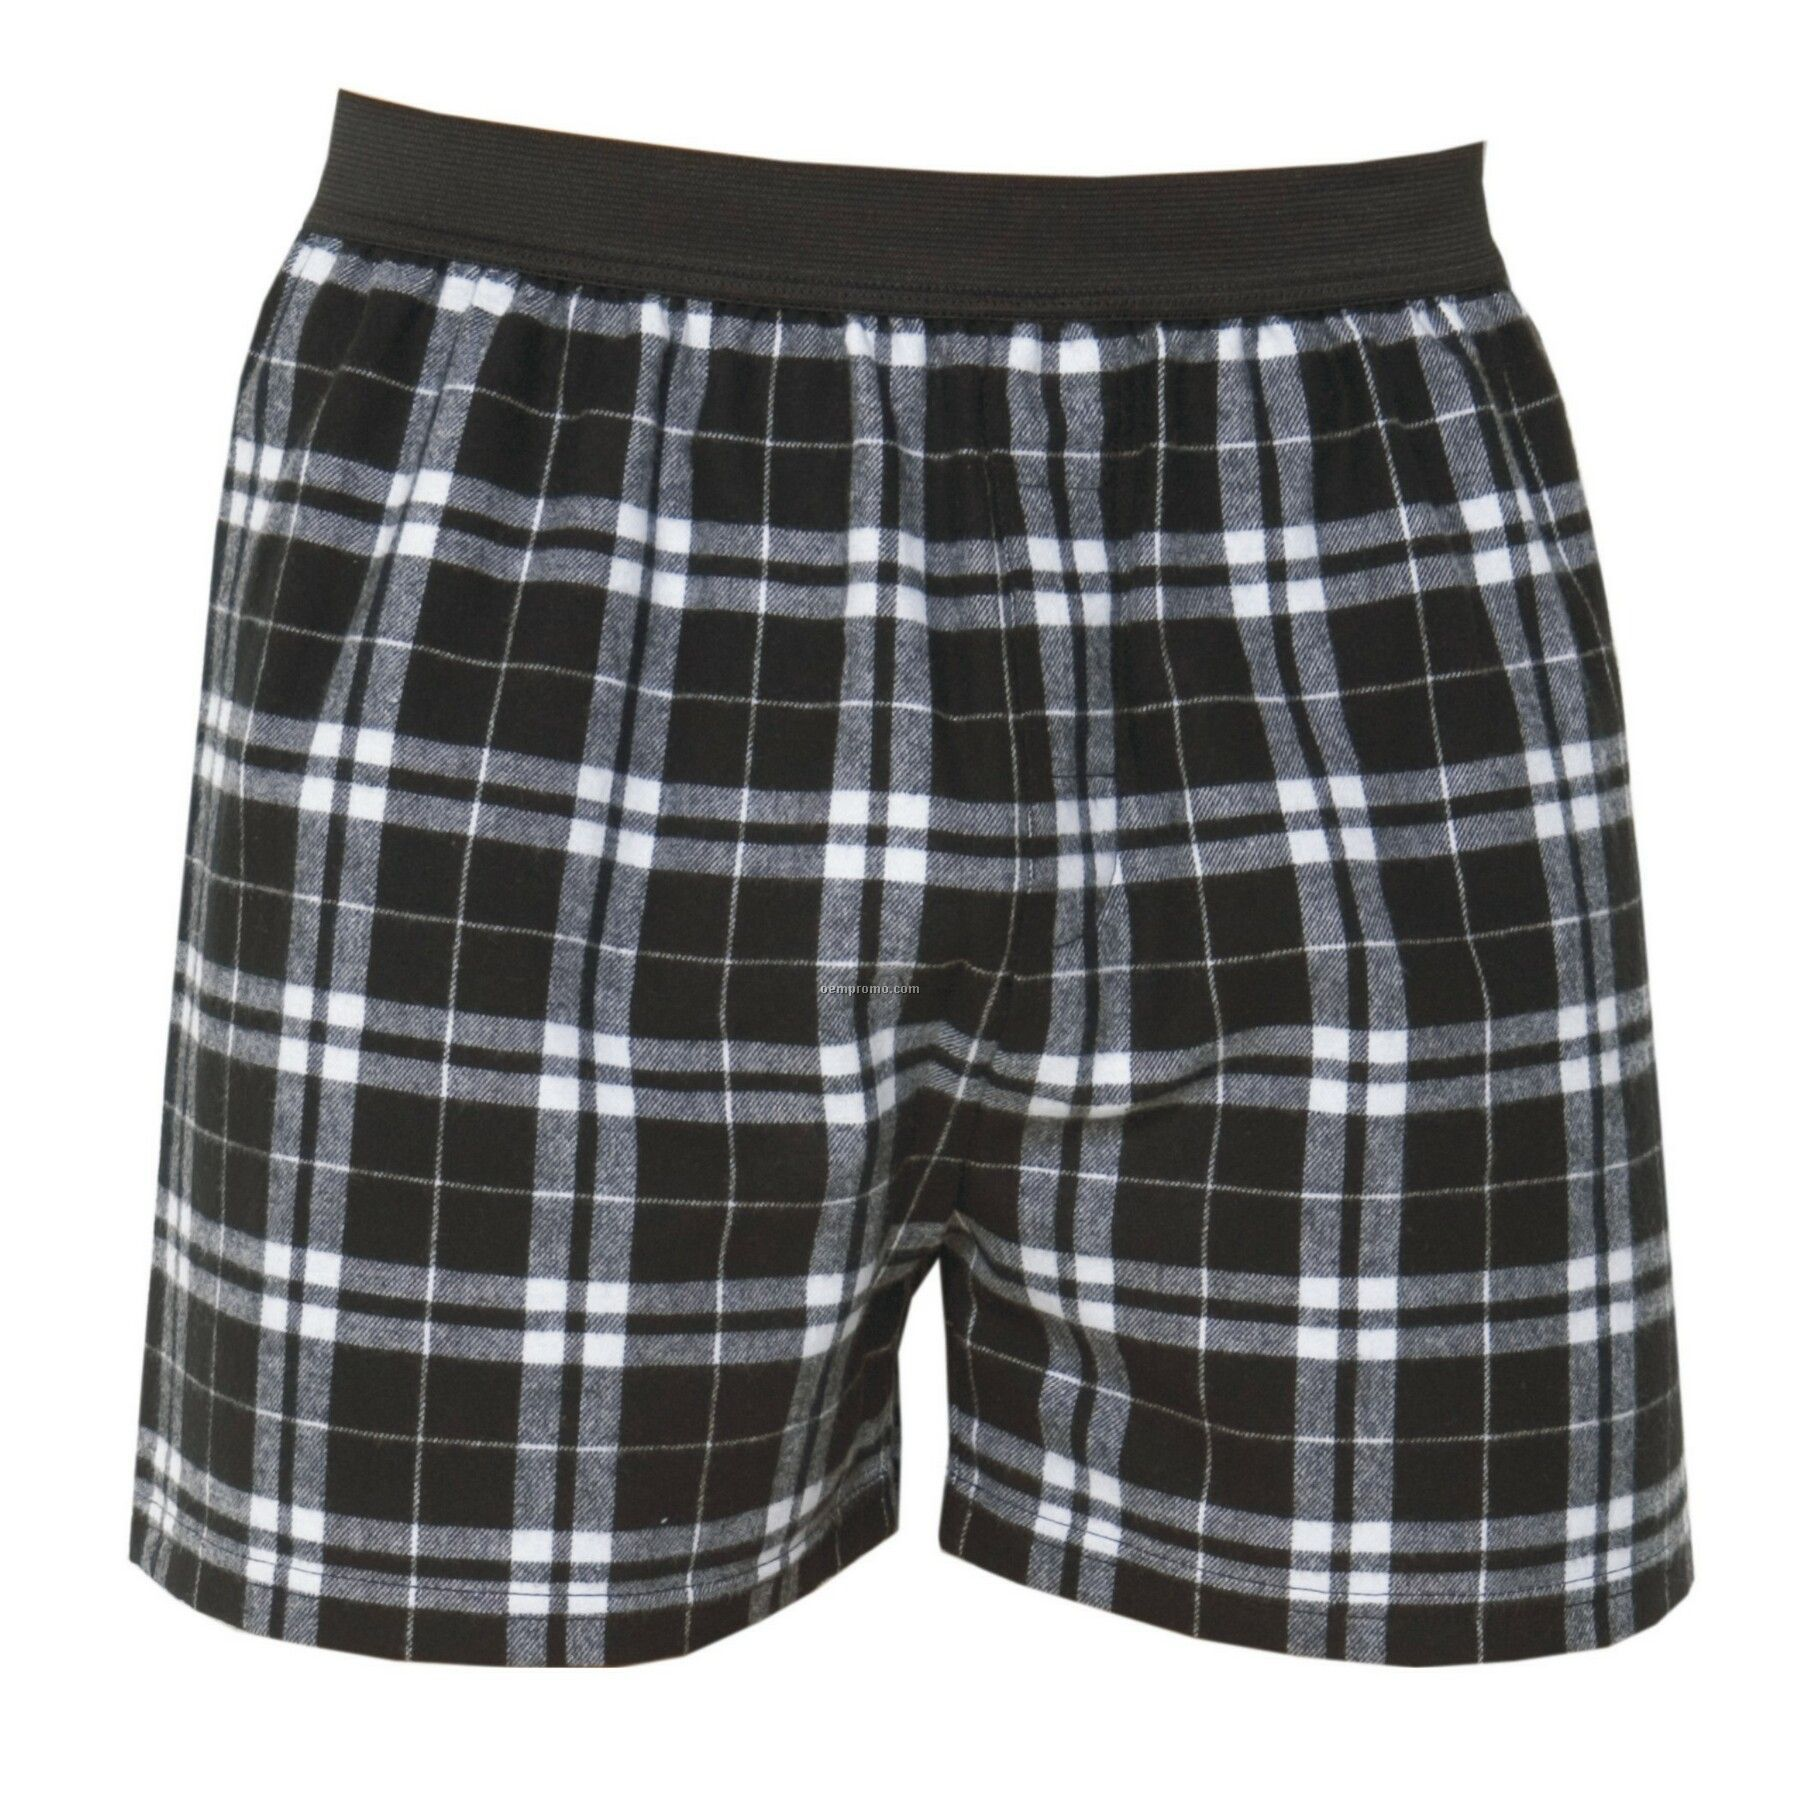 Adult Black/White Plaid Classic Boxer Short